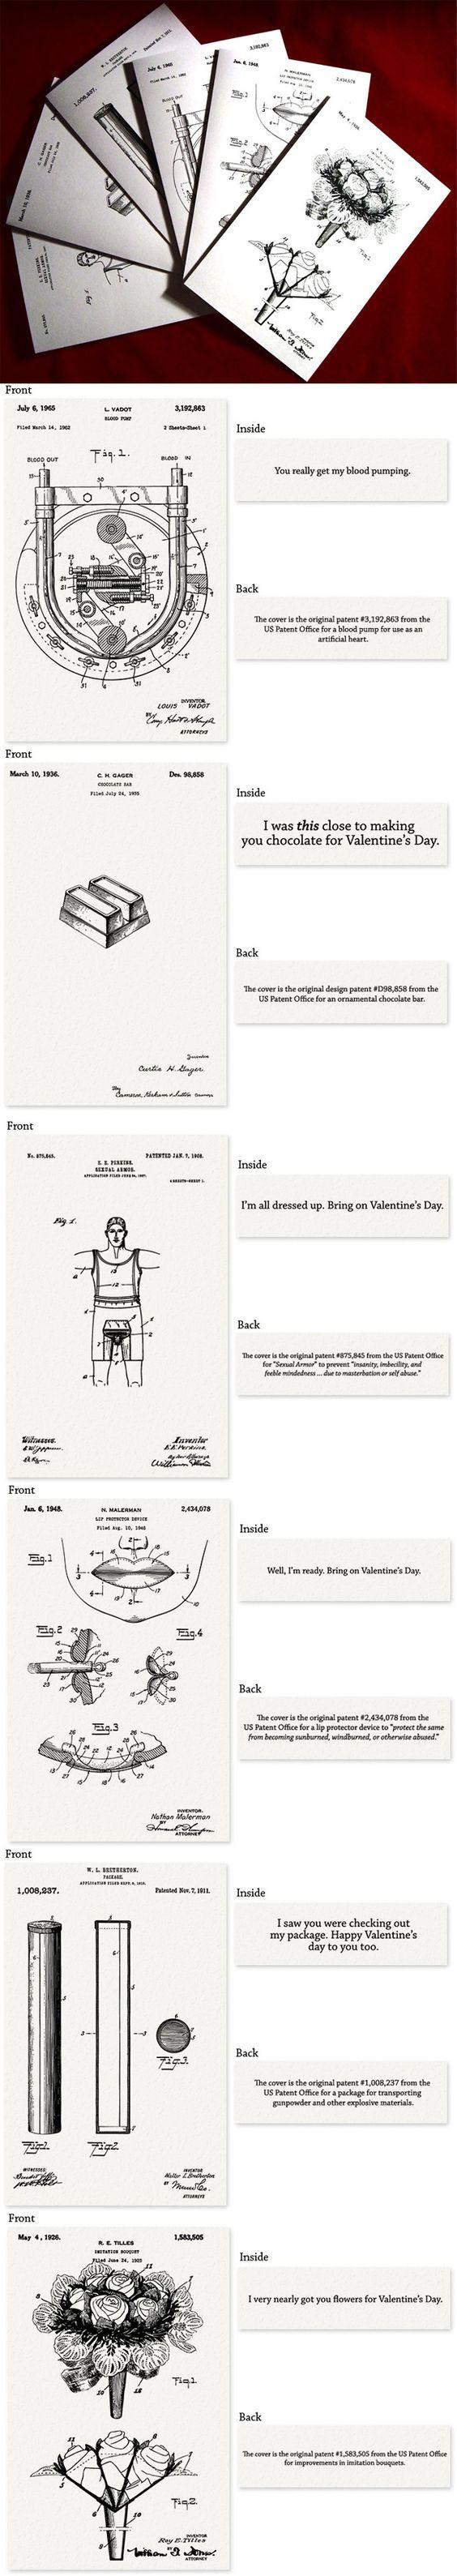 the st. valentine's day massacre photos